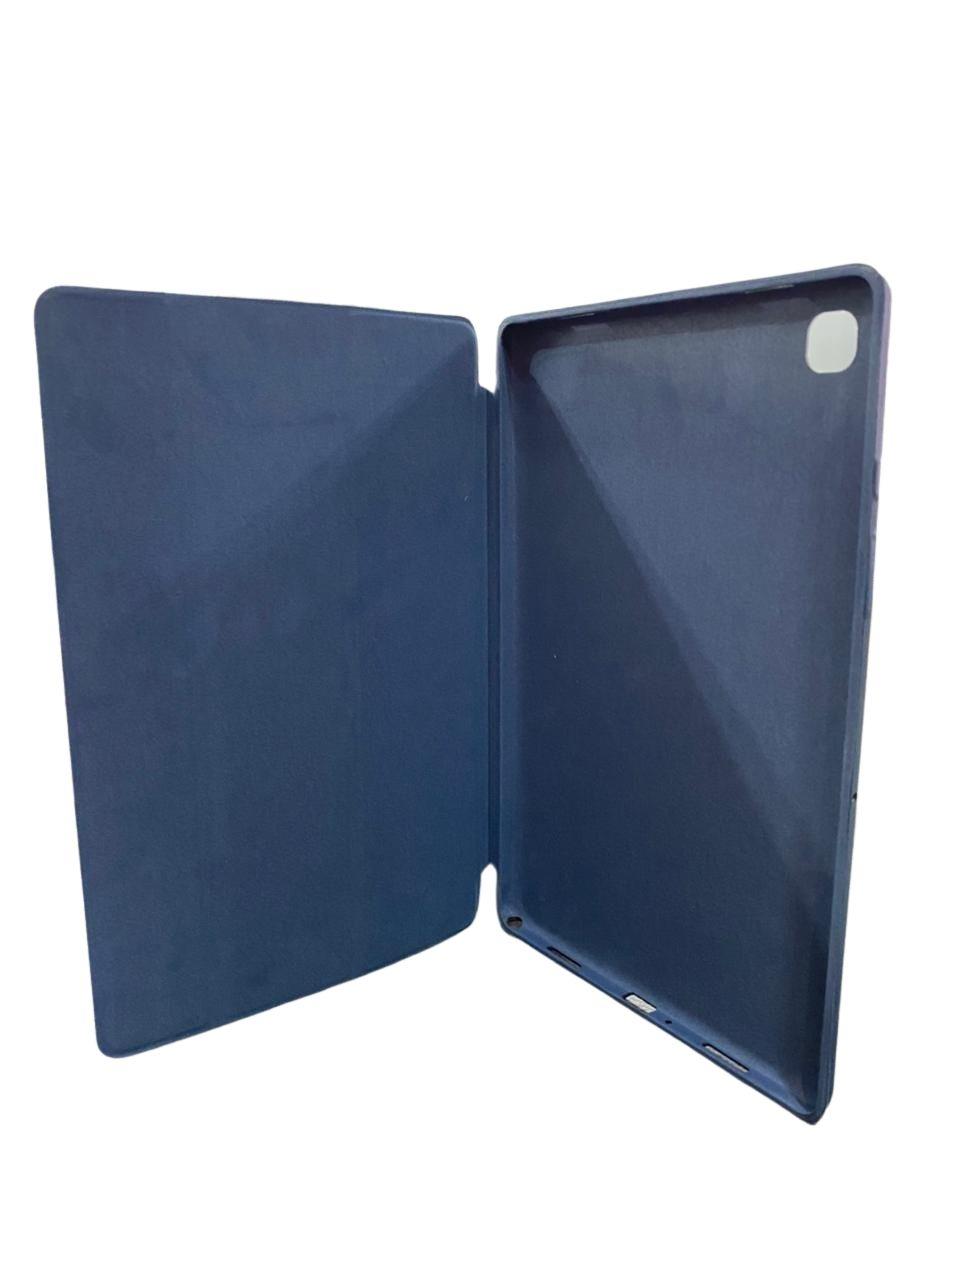 Smart Case Samsung Galaxy Tab A7 10.4 T500 T505 Magnética Slim Azul Marinho